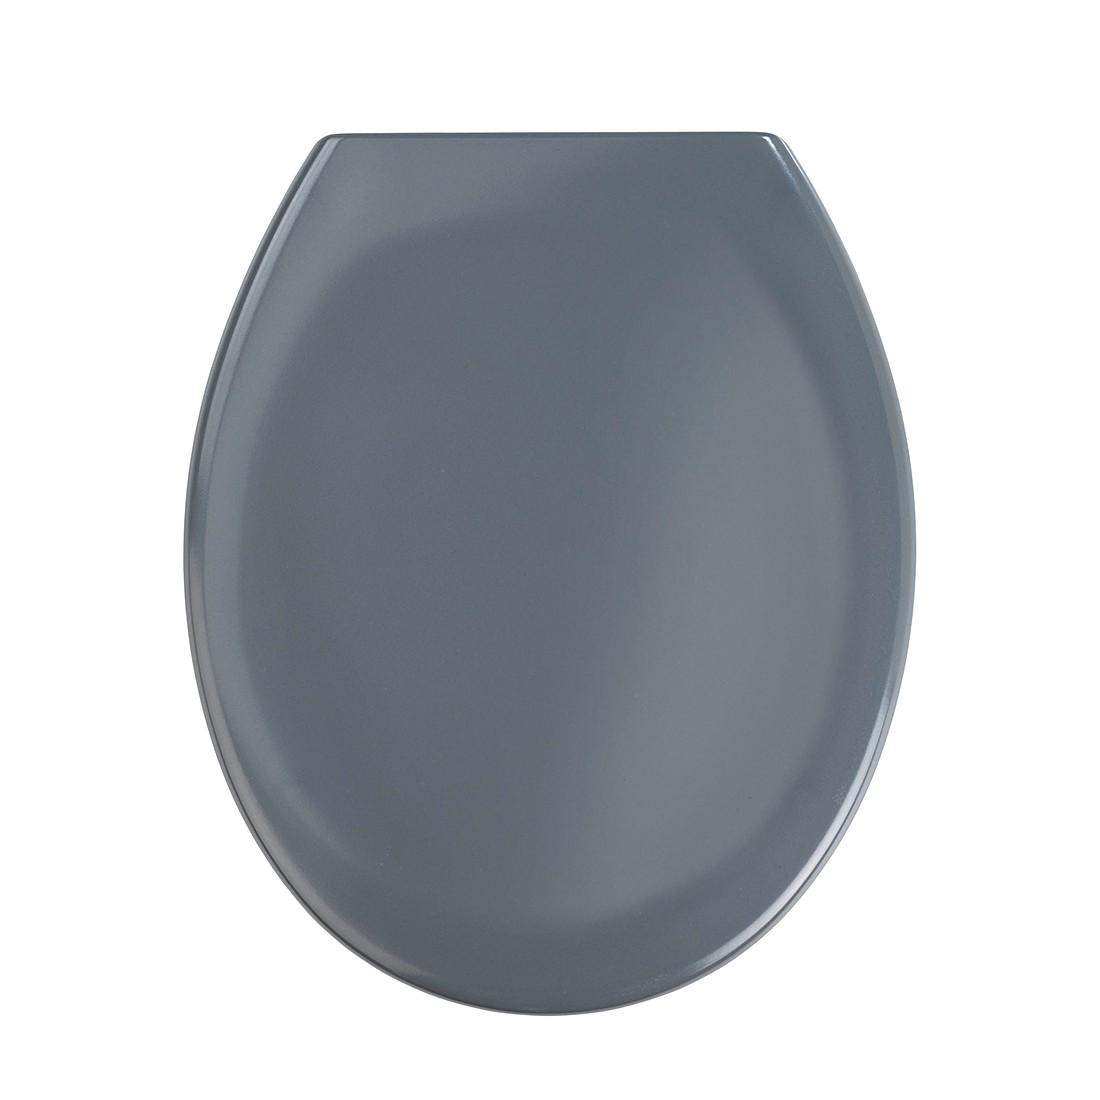 Premium wc-bril Ottana (met softclose) - donkergrijs, Wenko